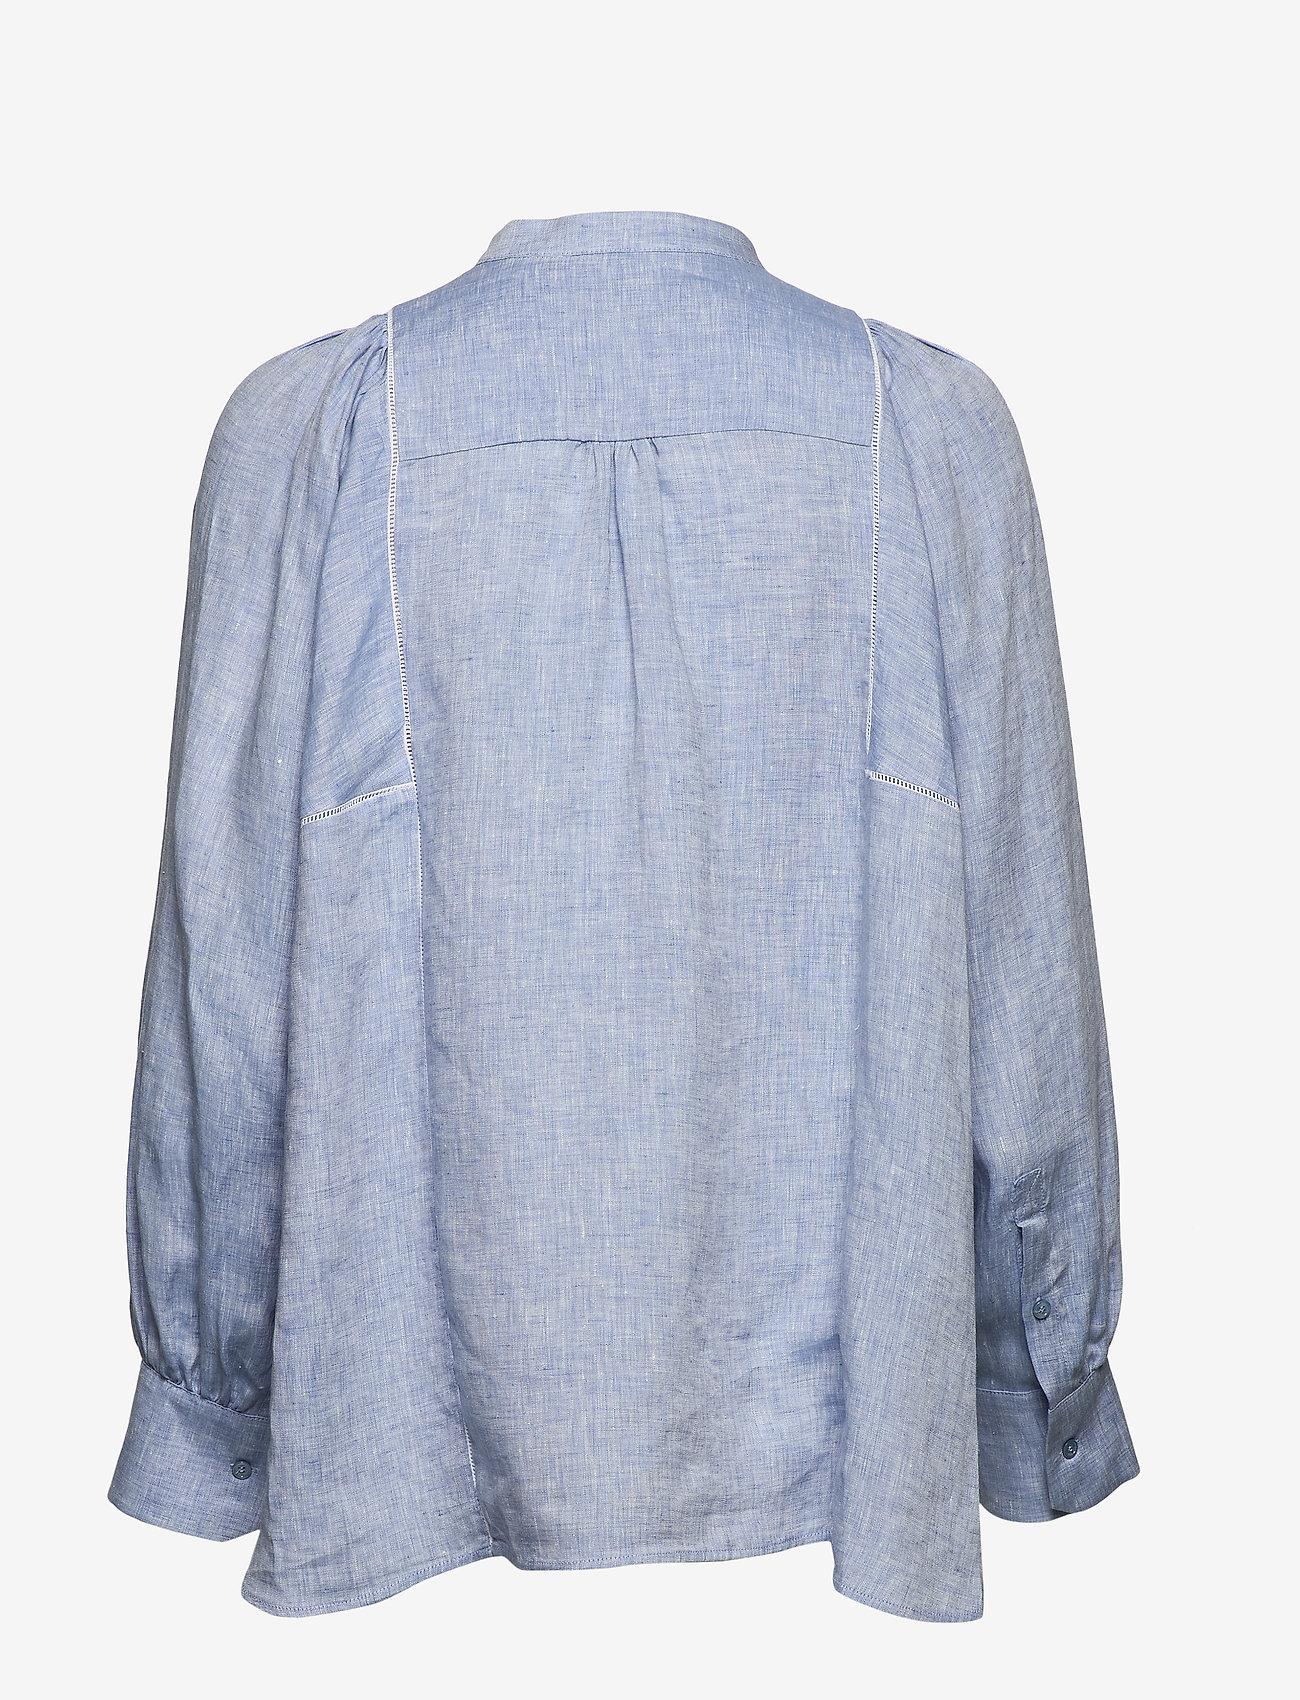 Weekend Max Mara - MALAGA - chemises à manches longues - light blue